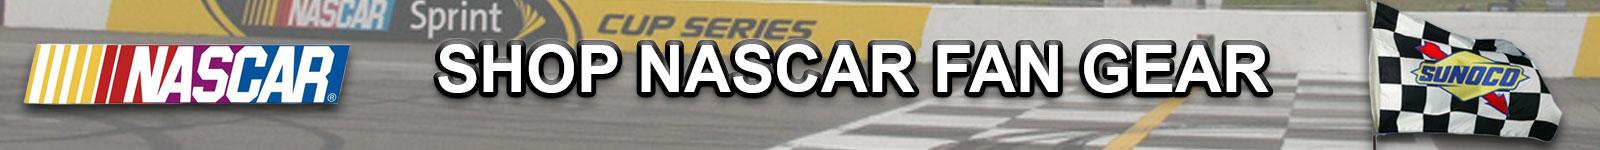 nascar-league-banner-1-.jpg